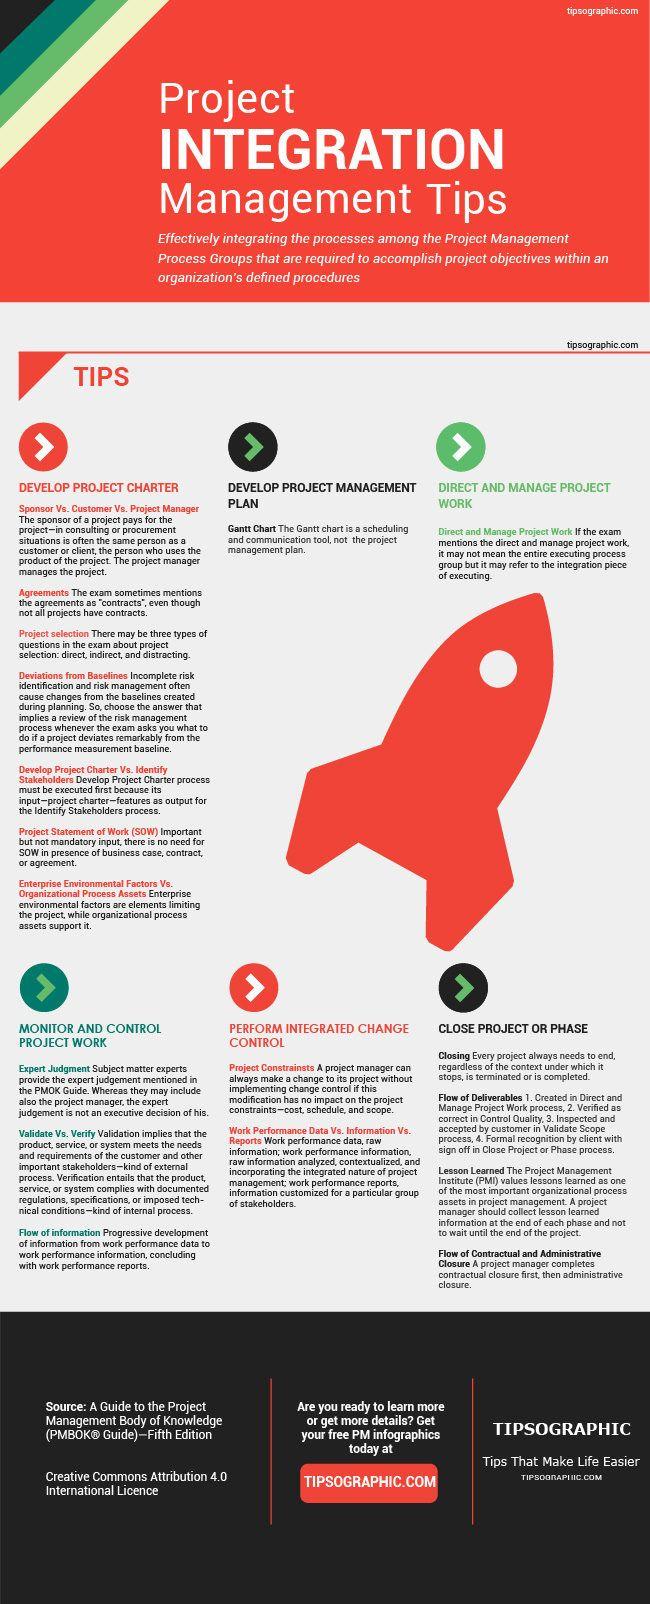 Pmp Certification Project Integration Management Tips Management